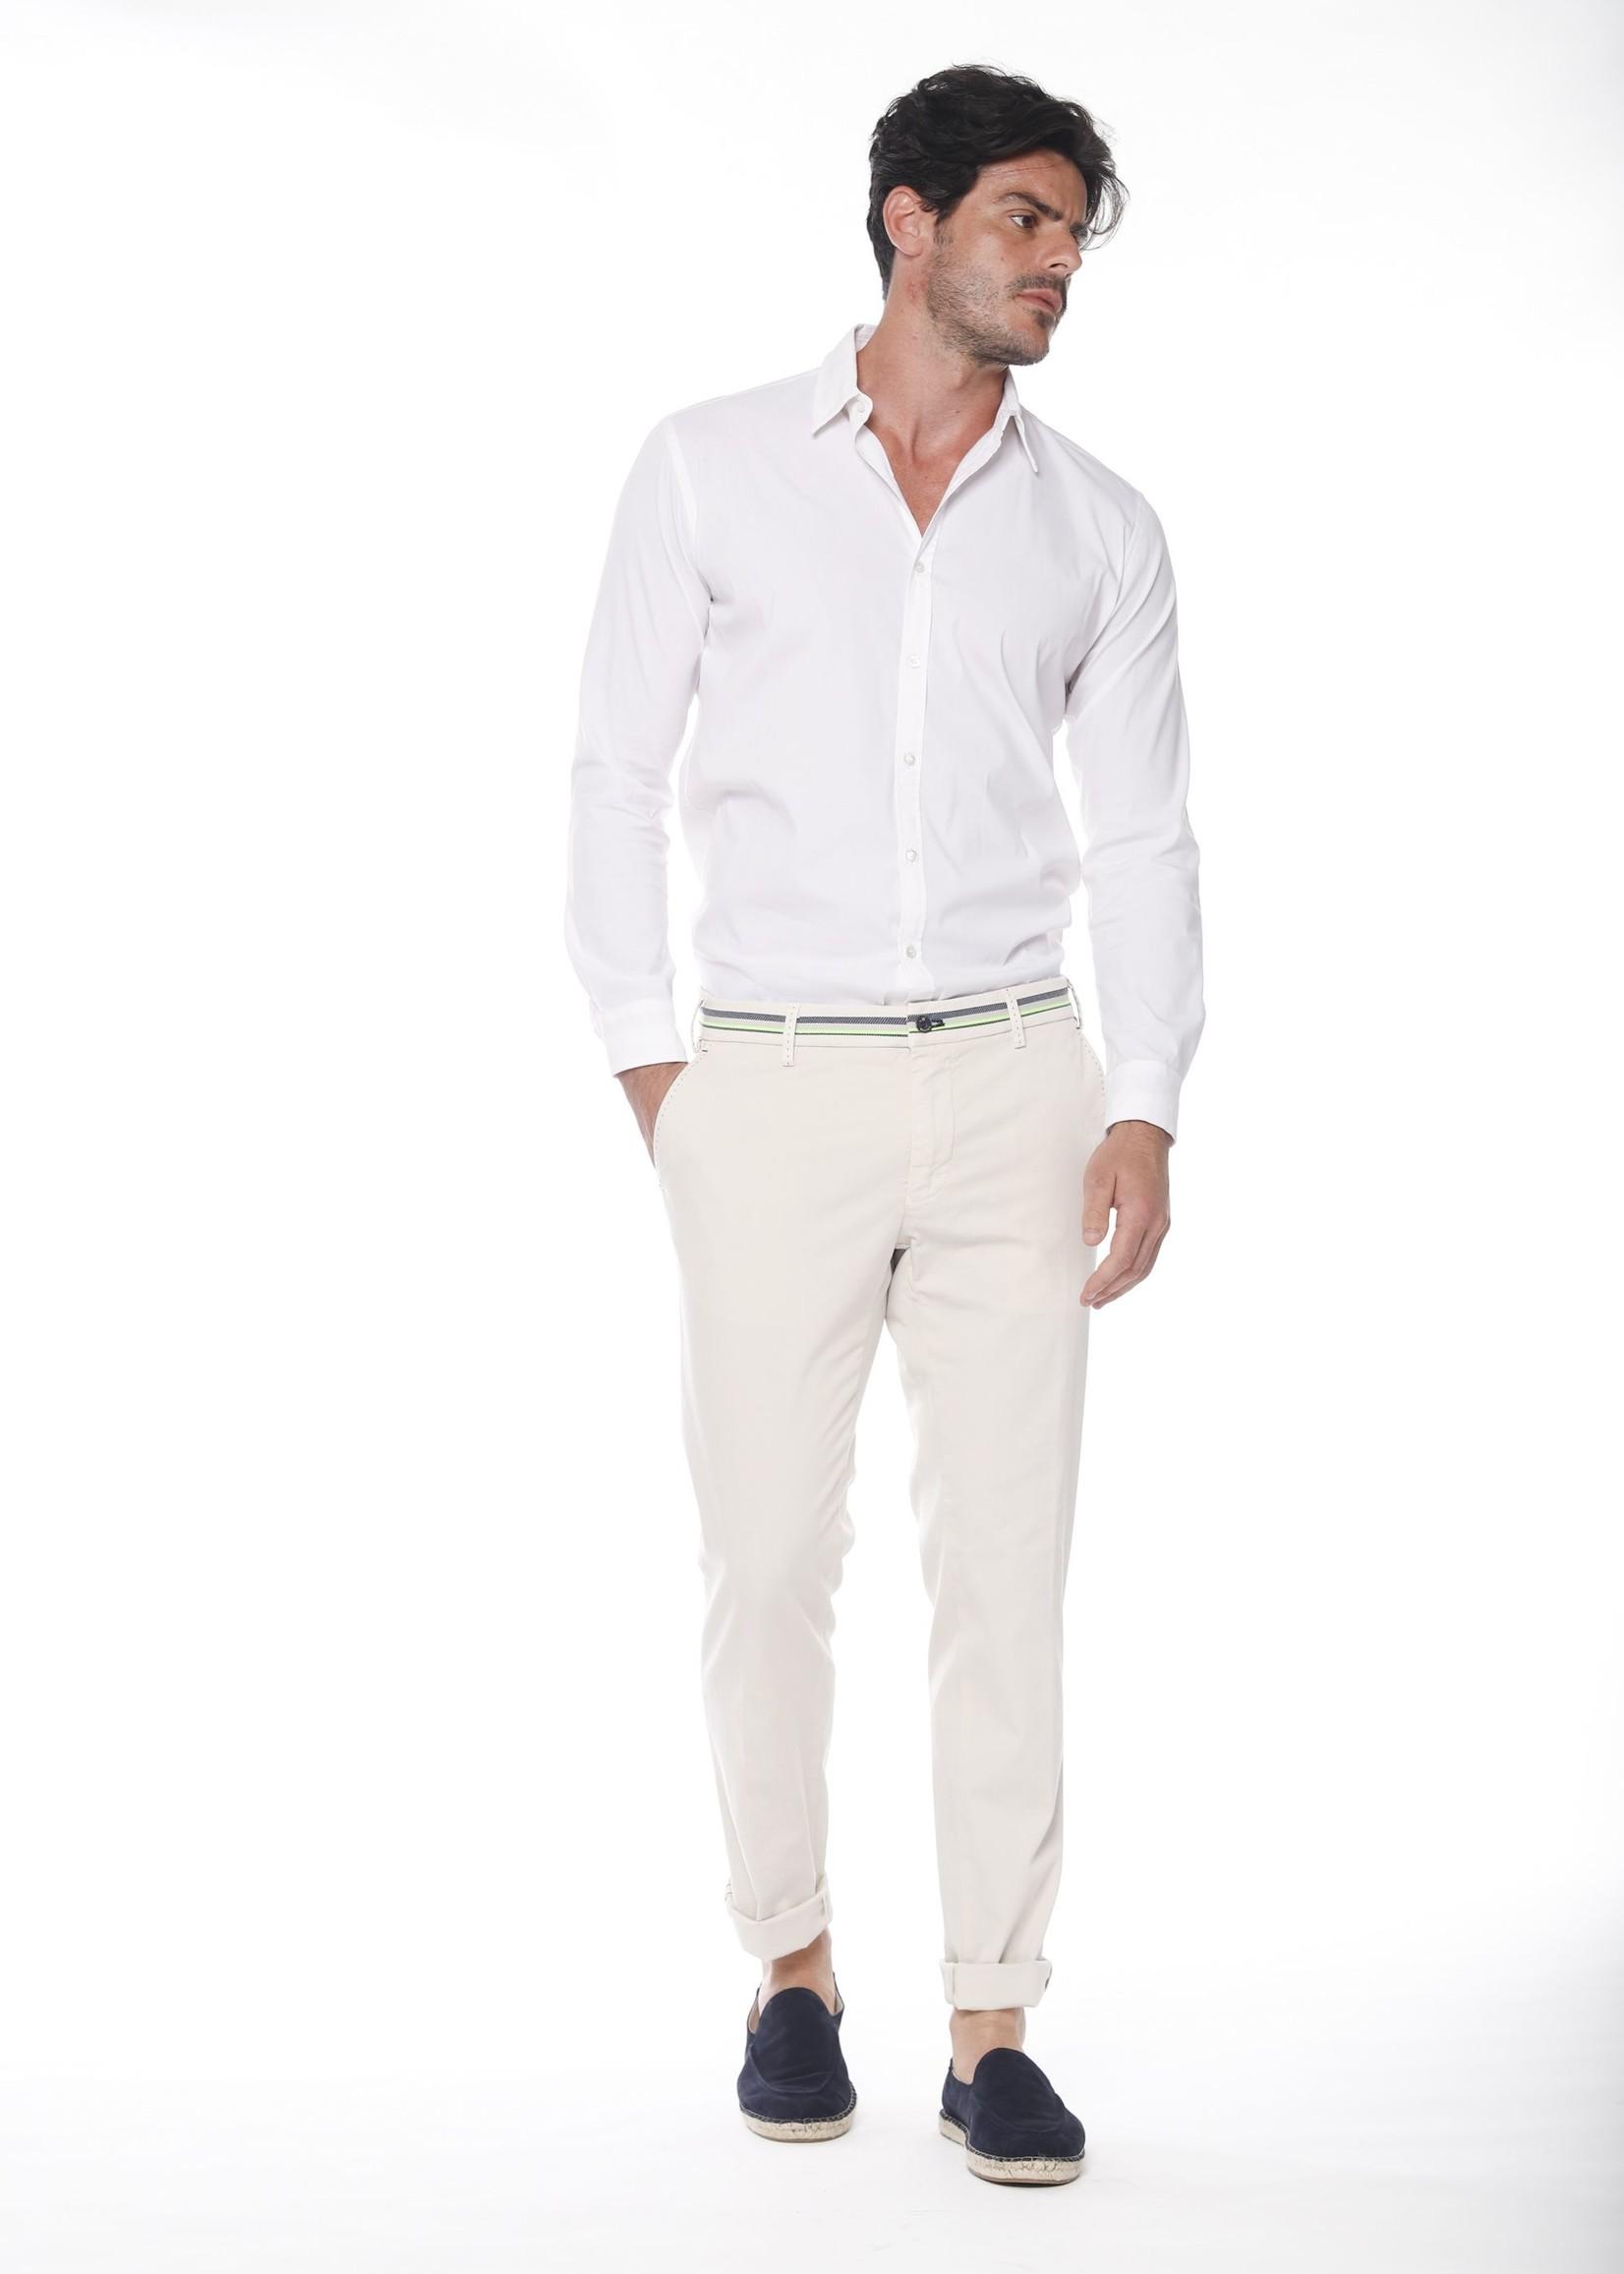 Mason's Pants stretch satin extra slim fit | Beige | Mason's